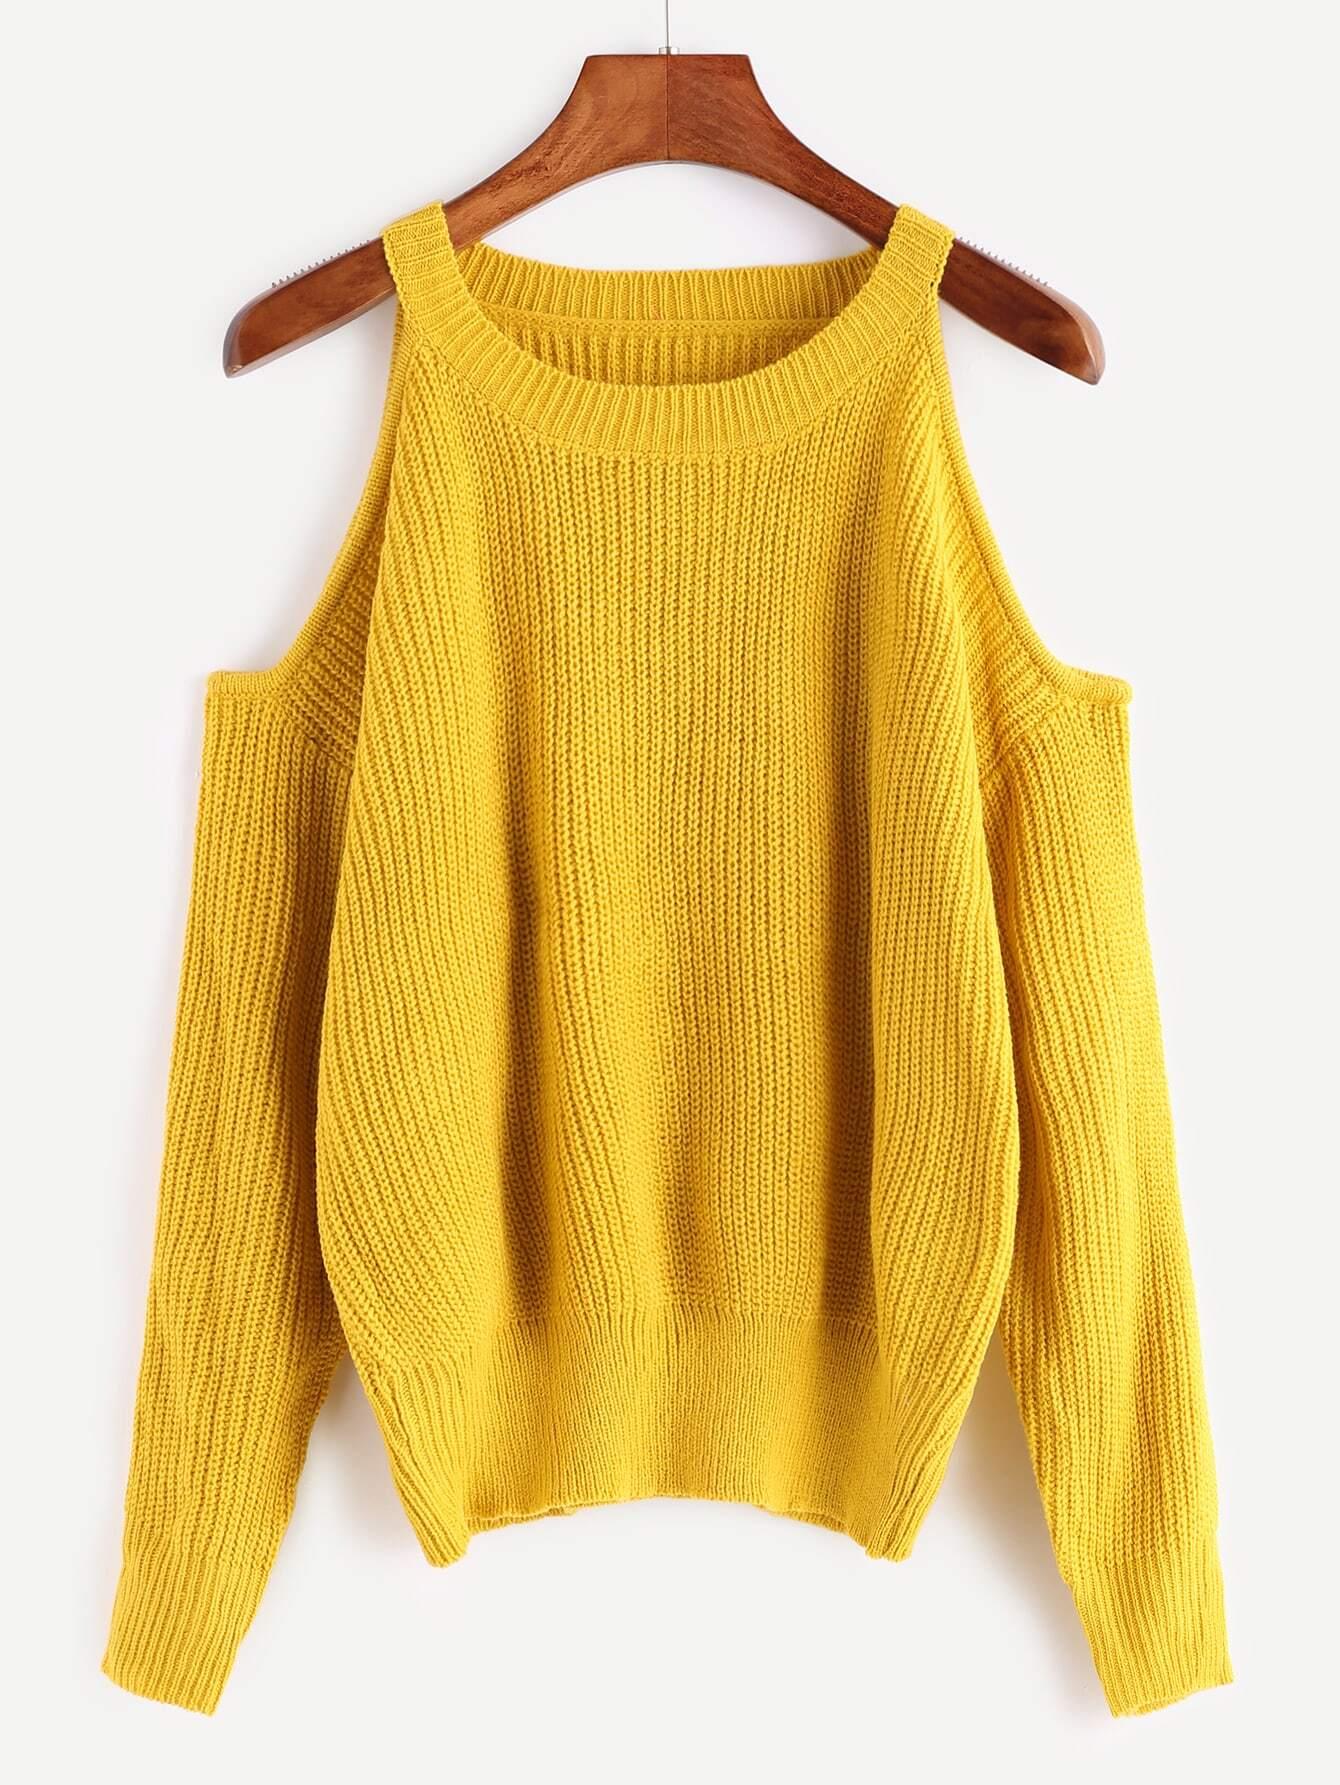 Yellow Open Shoulder Knit SweaterYellow Open Shoulder Knit Sweater<br><br>color: Yellow<br>size: one-size